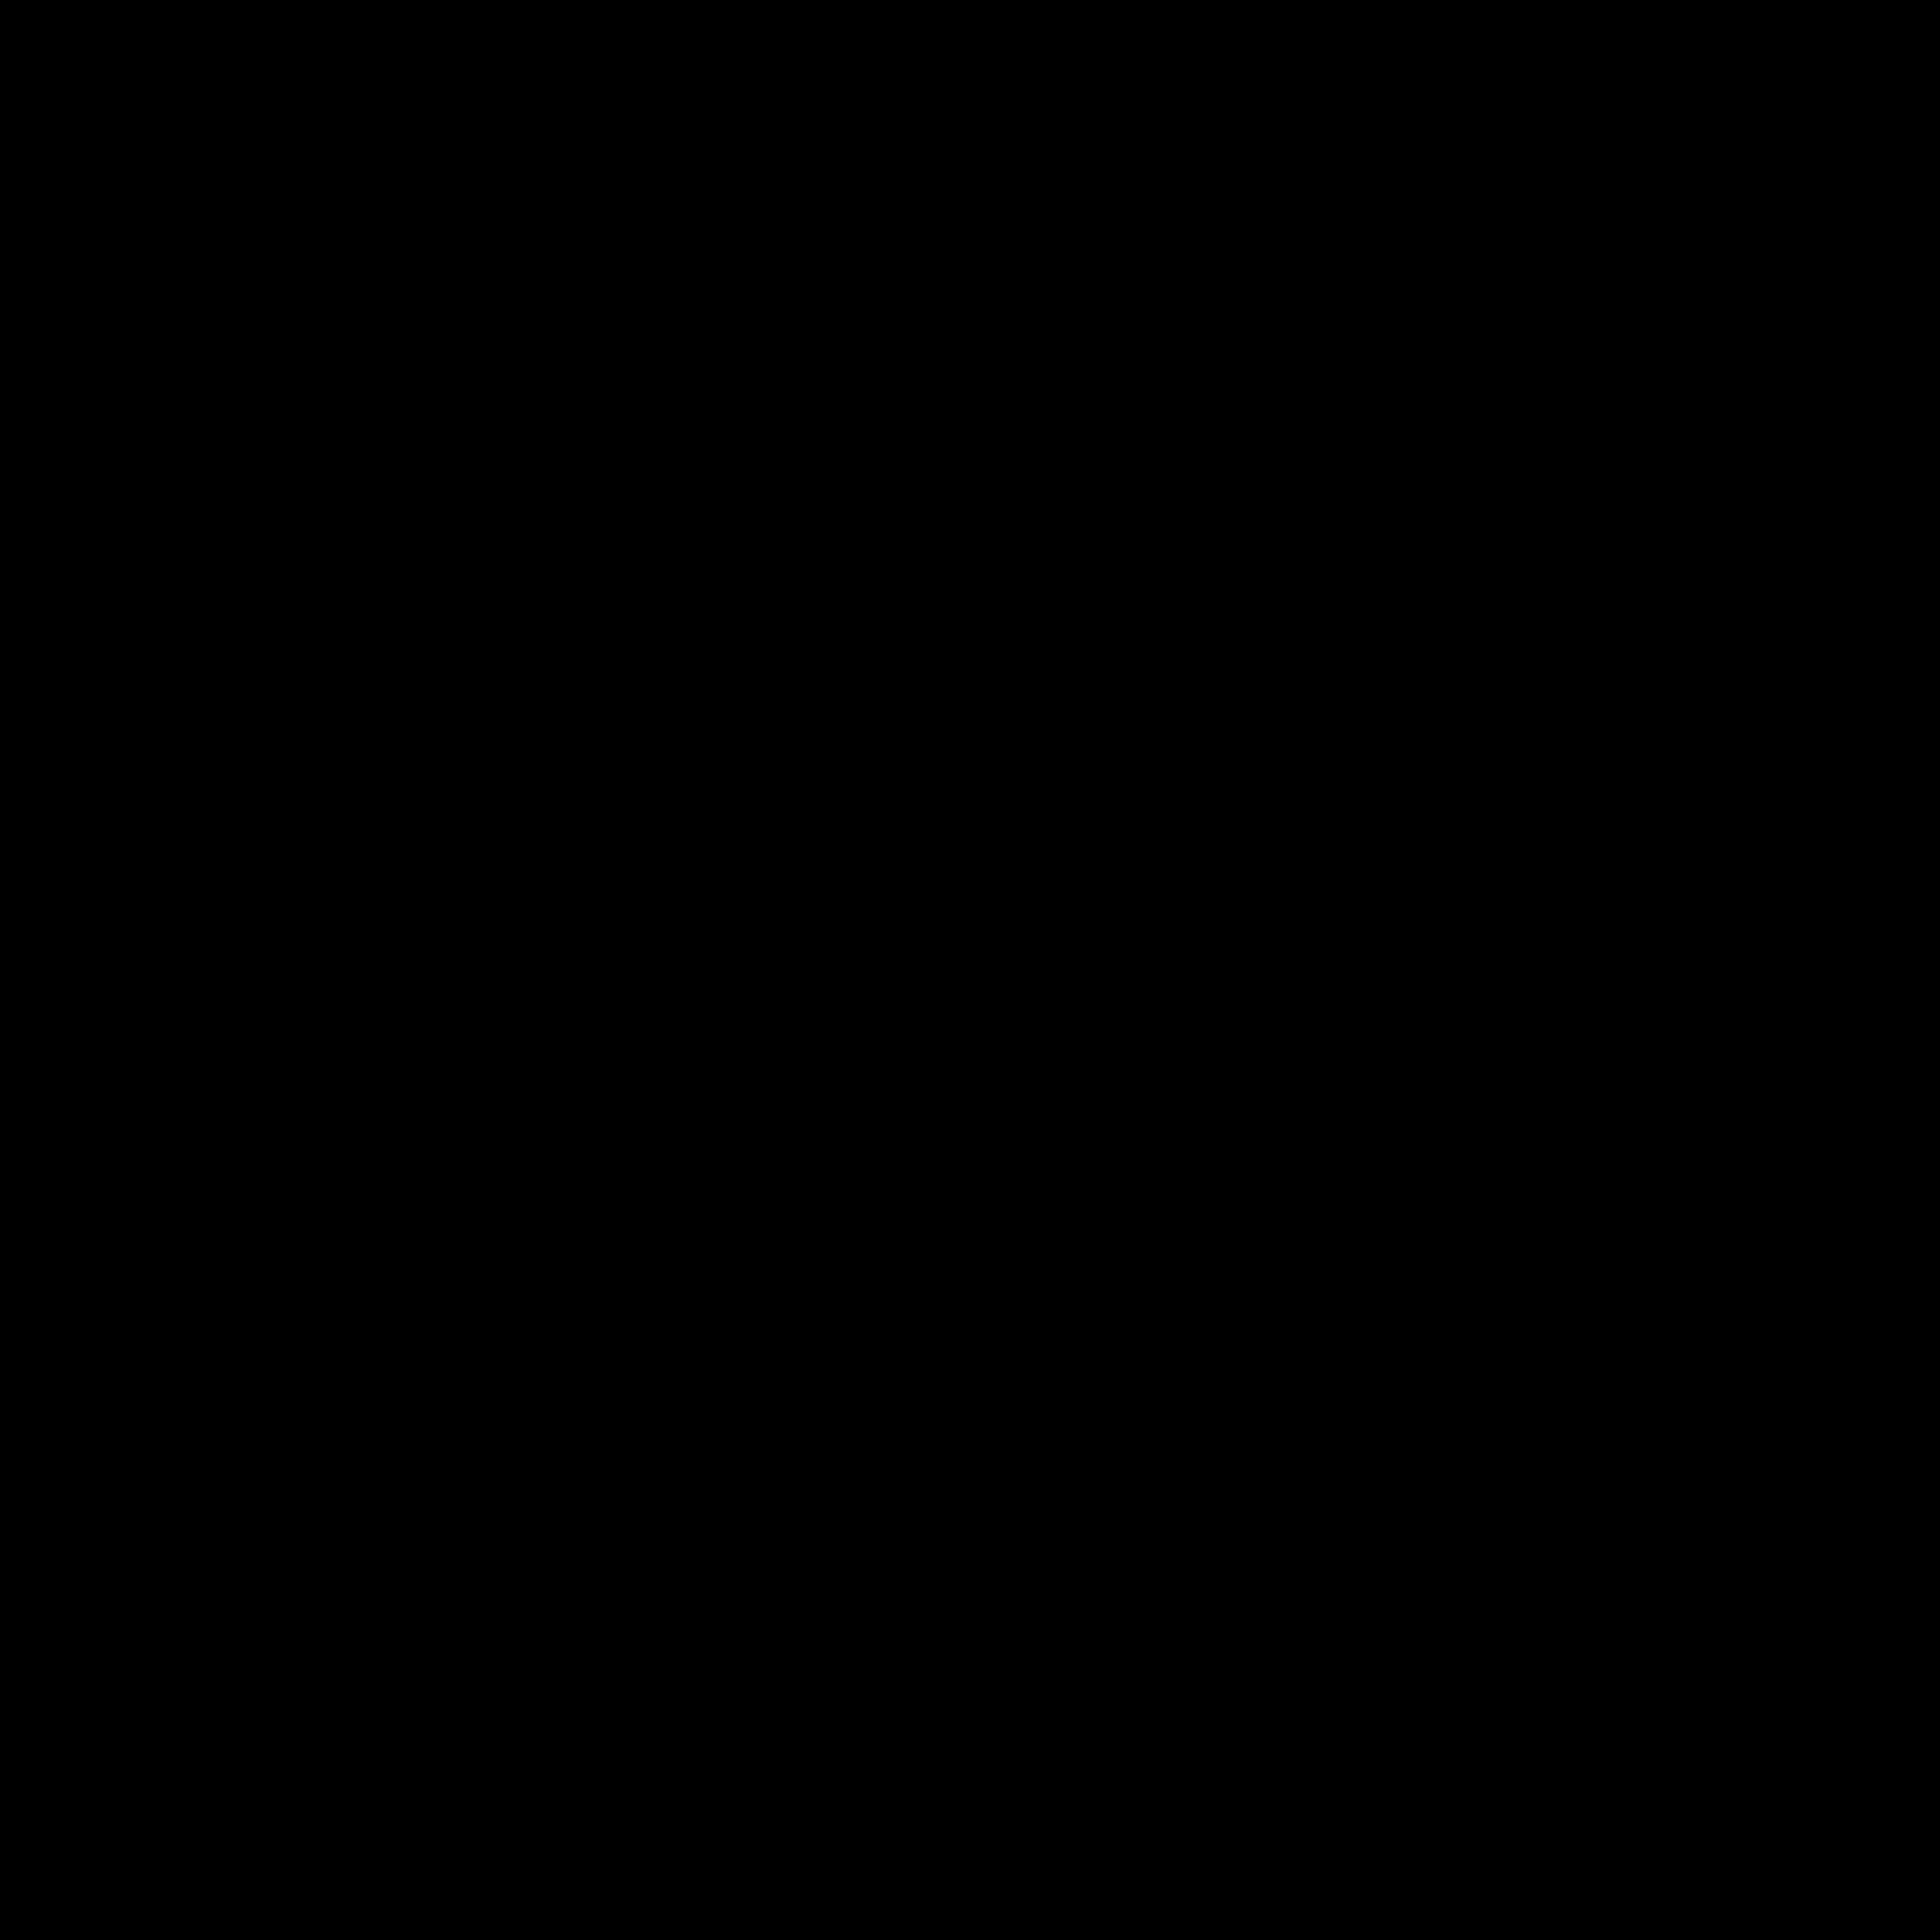 A-zalea